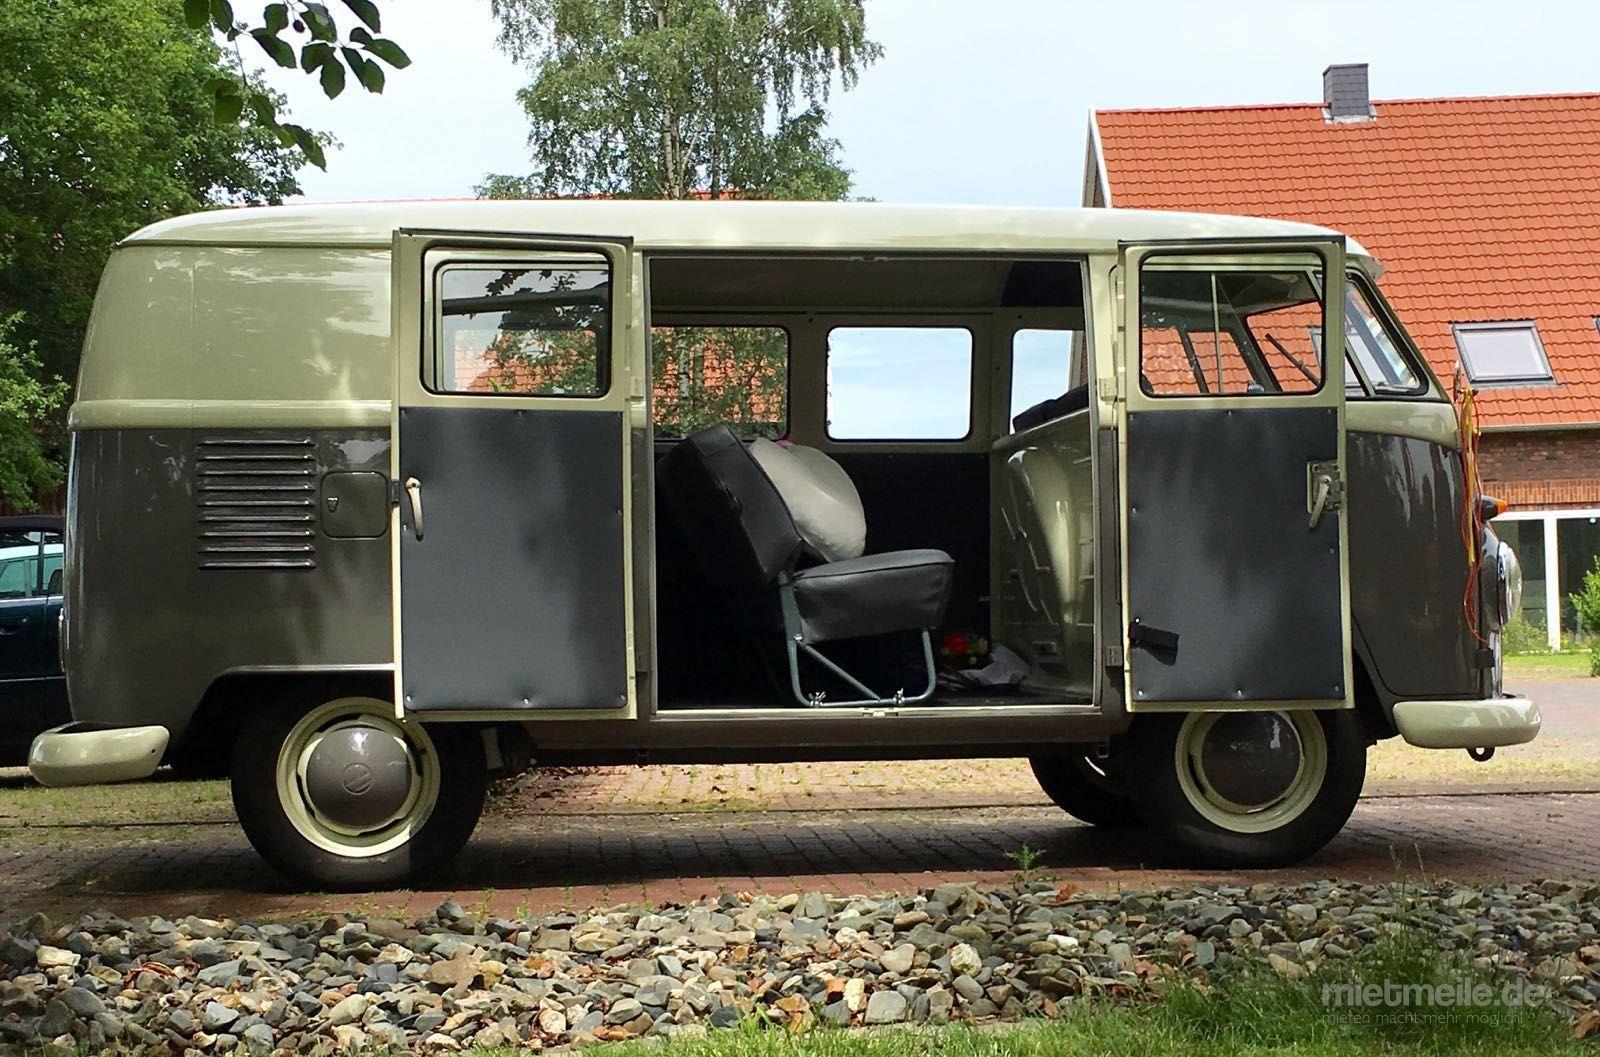 oldtimer vw bulli t2 t1 bus hochzeitsautomieten mieten. Black Bedroom Furniture Sets. Home Design Ideas